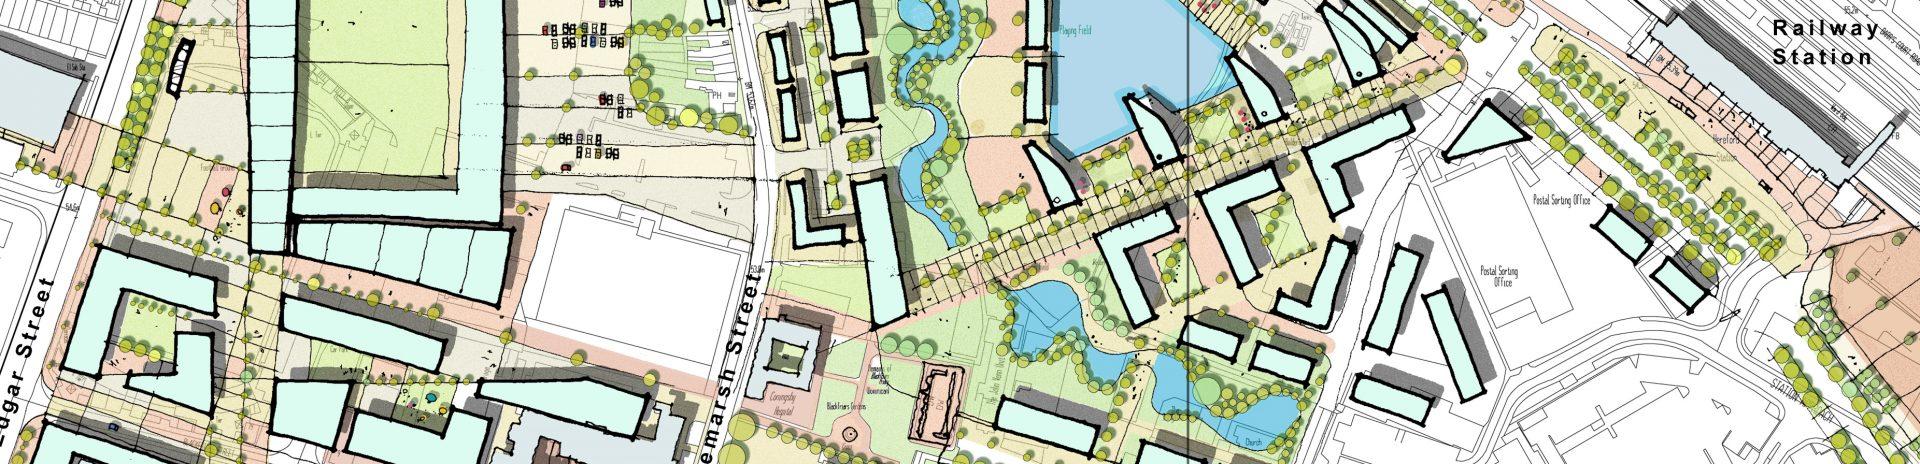 20:20 Vision Hereford Edgar Street Grid Masterplan